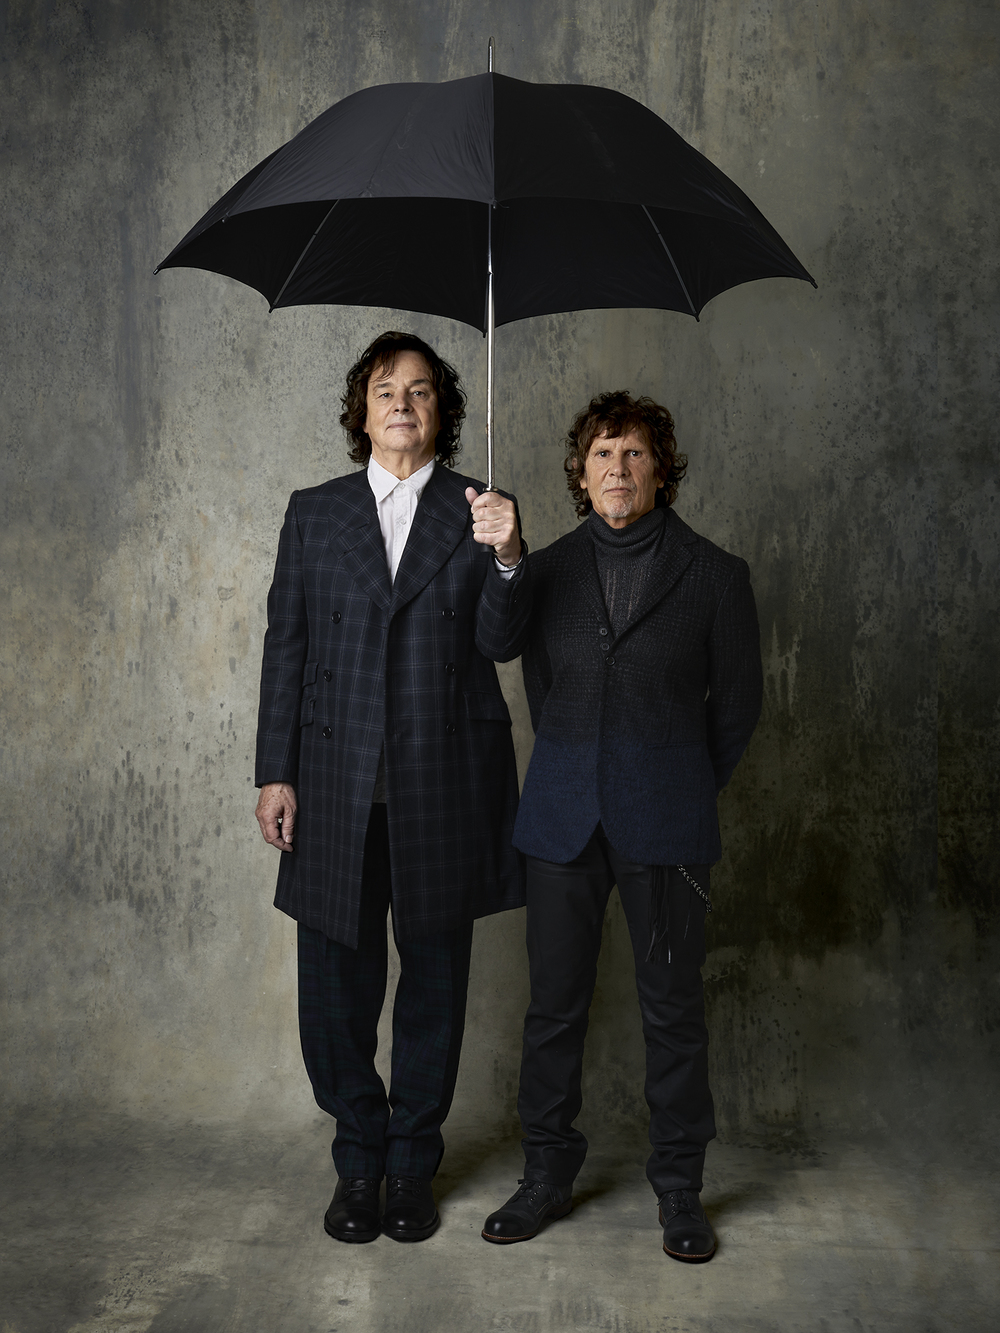 Colin Blunstone & Rod Argent